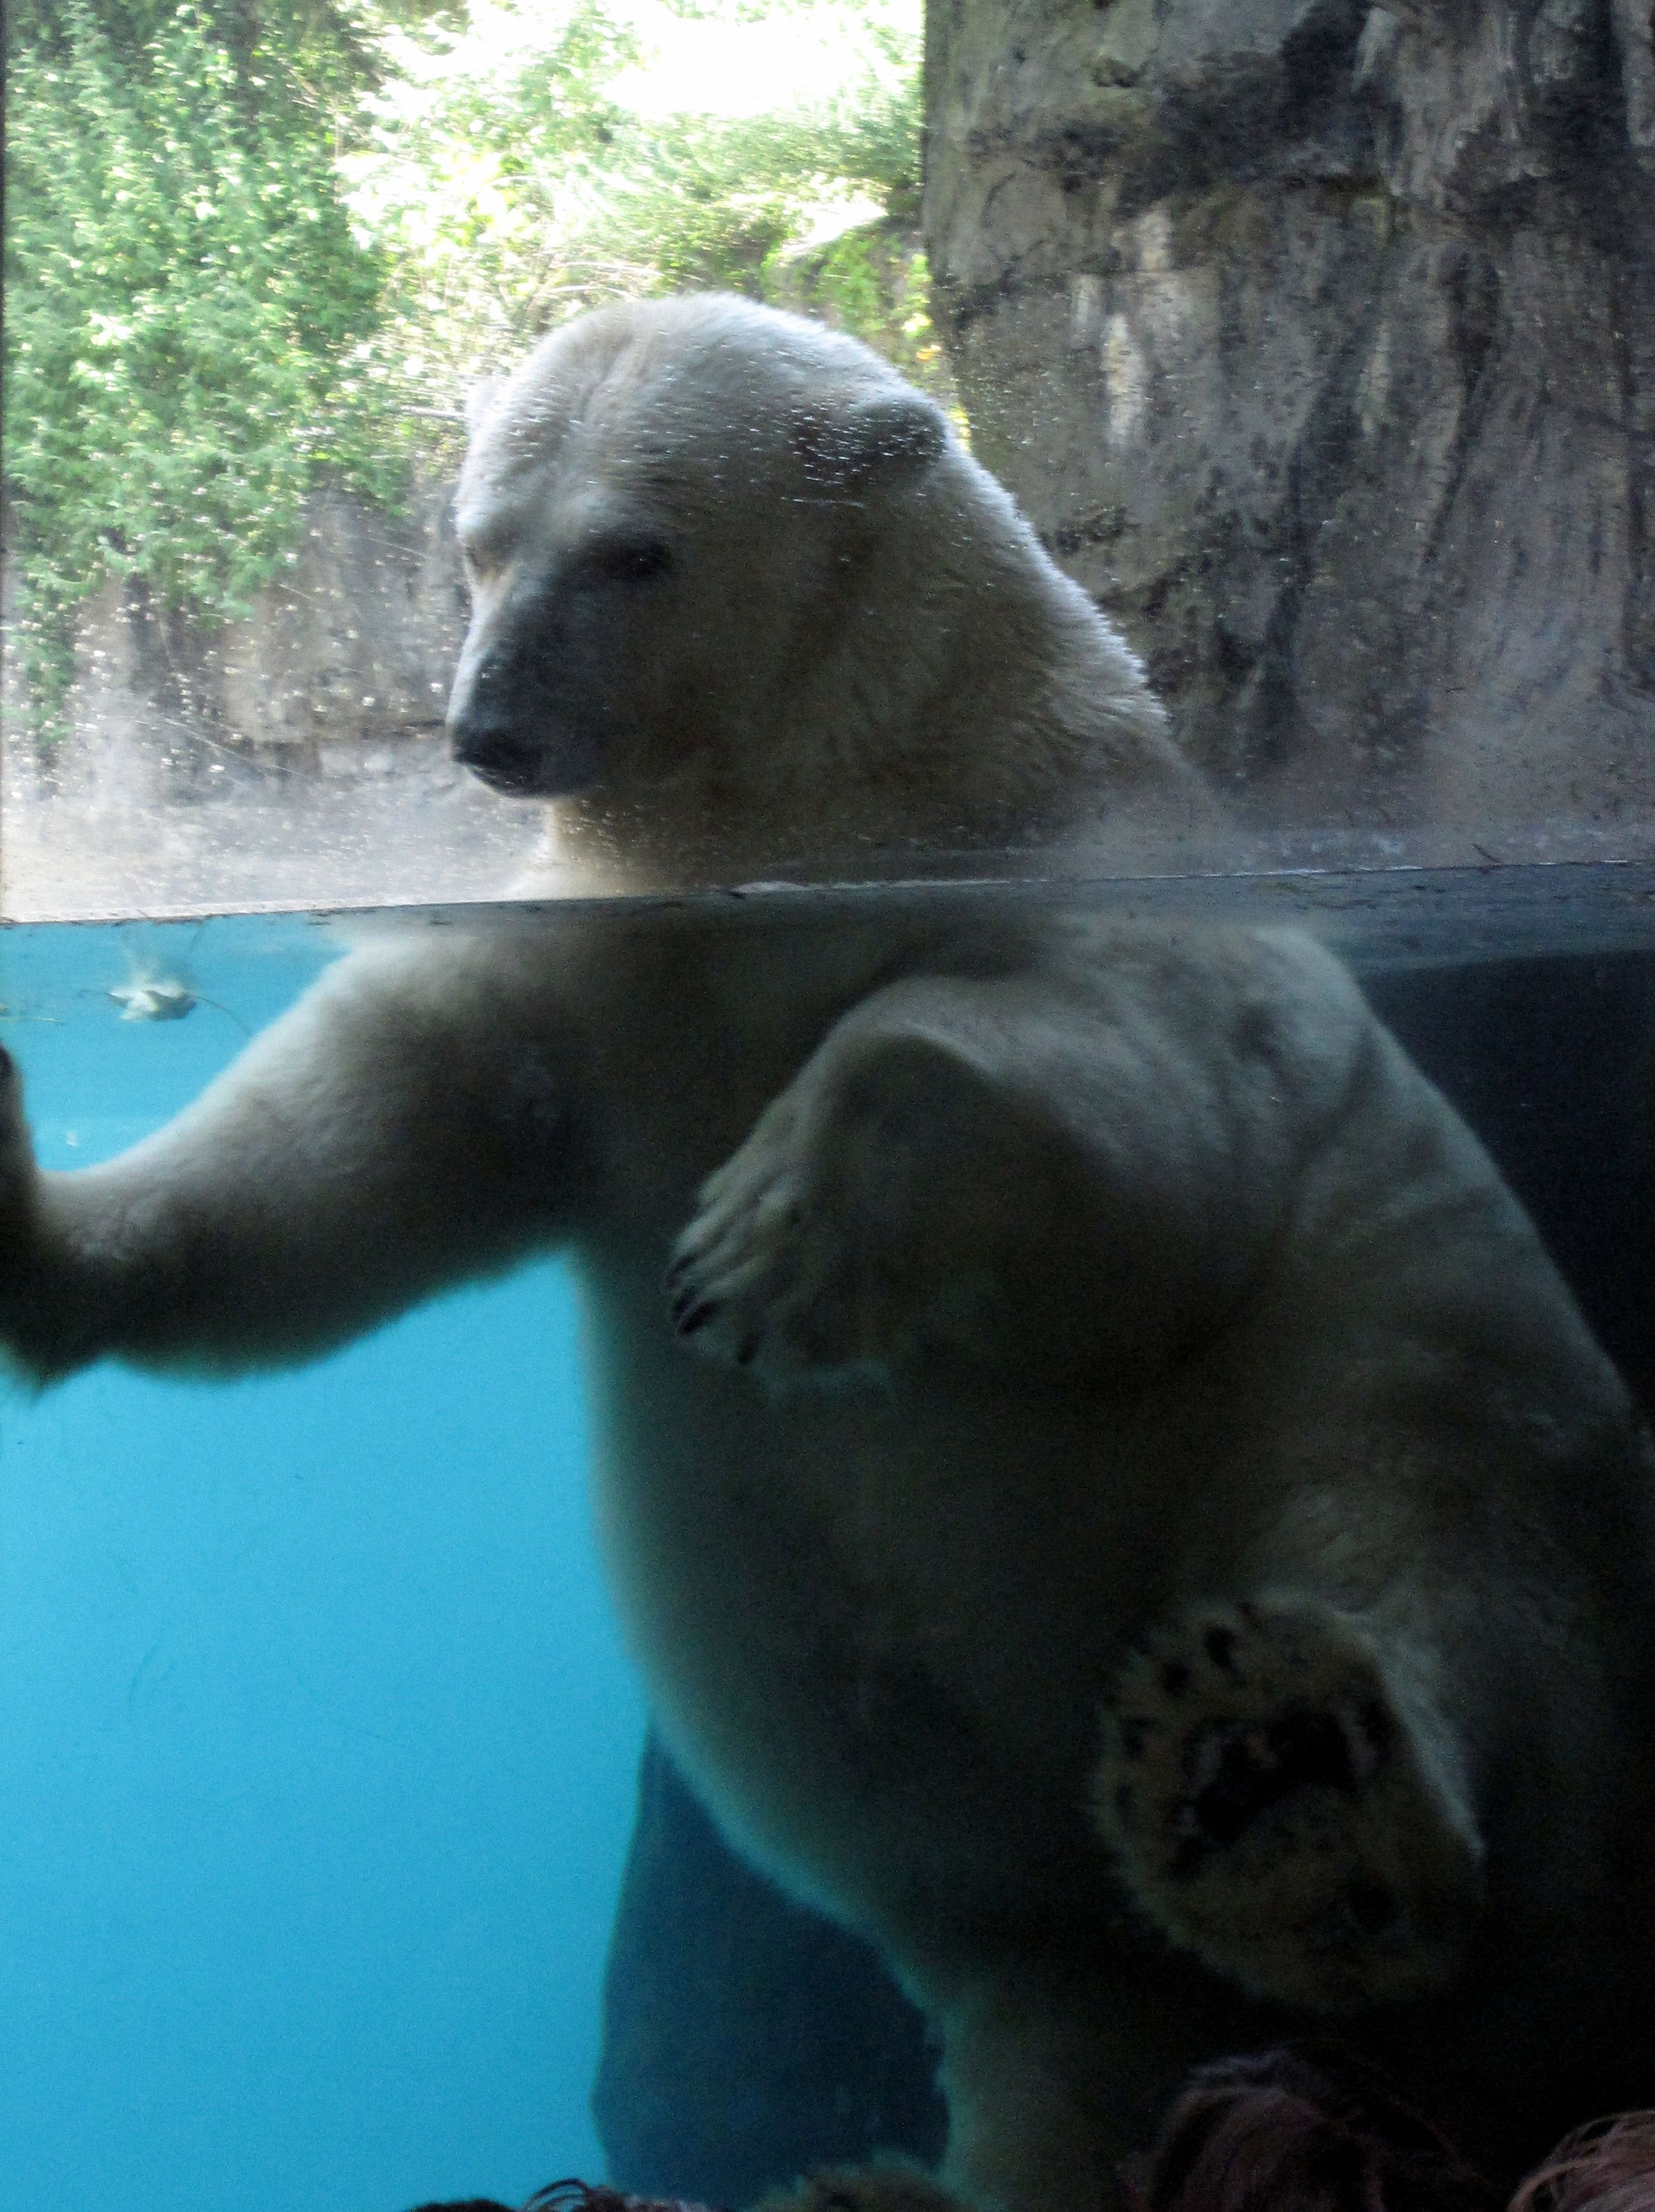 If I Cant See A Fashion Show I Want To Go To The Zoo Polar Bear S Aquatics Central Park Zoo New York New York Trip Planning Animals Beautiful Polar Bear